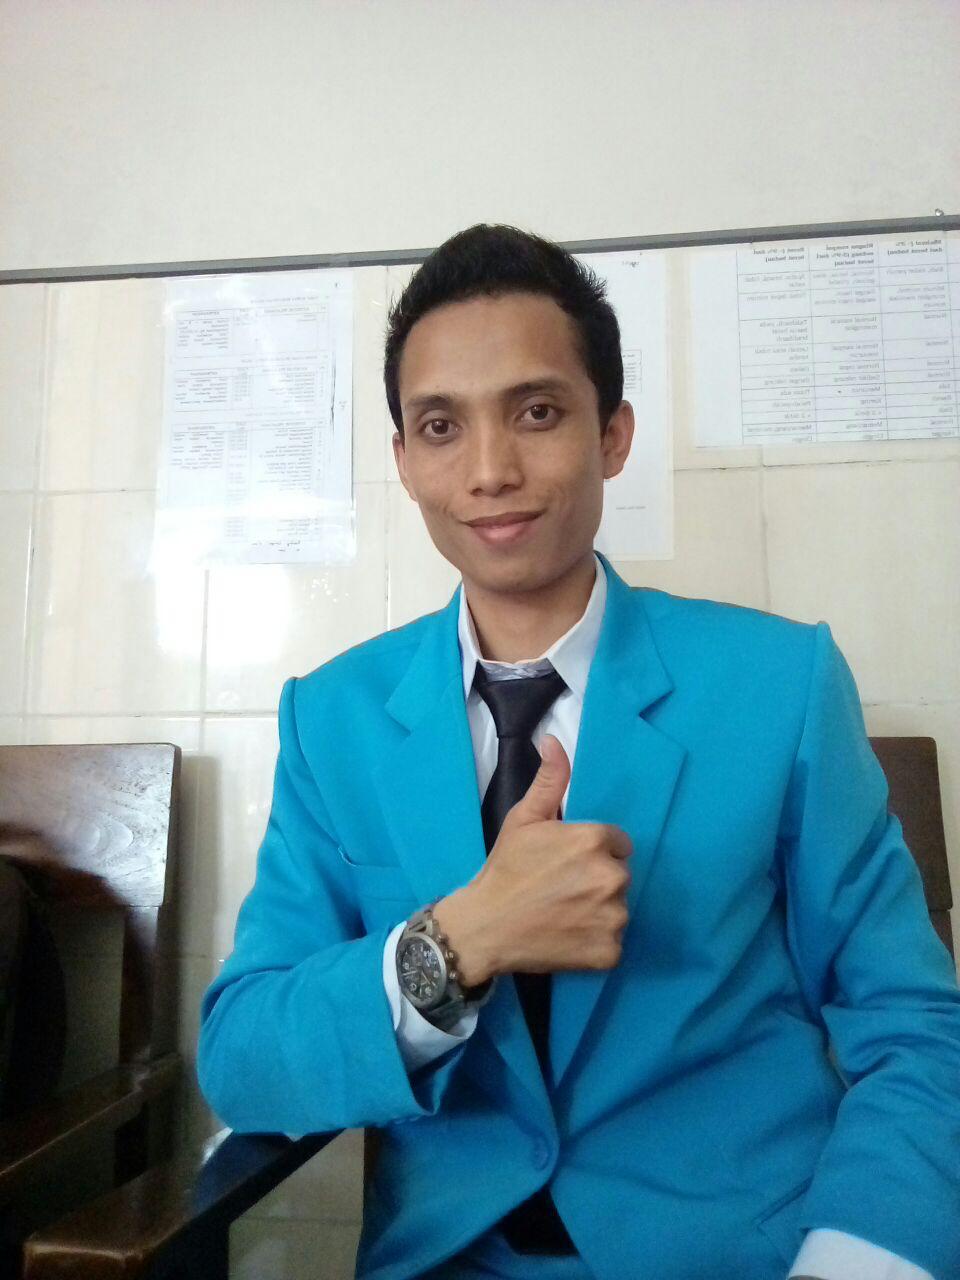 tempat sunatan khitan modern dan rawat luka kebumen jawa tengah Indonesia